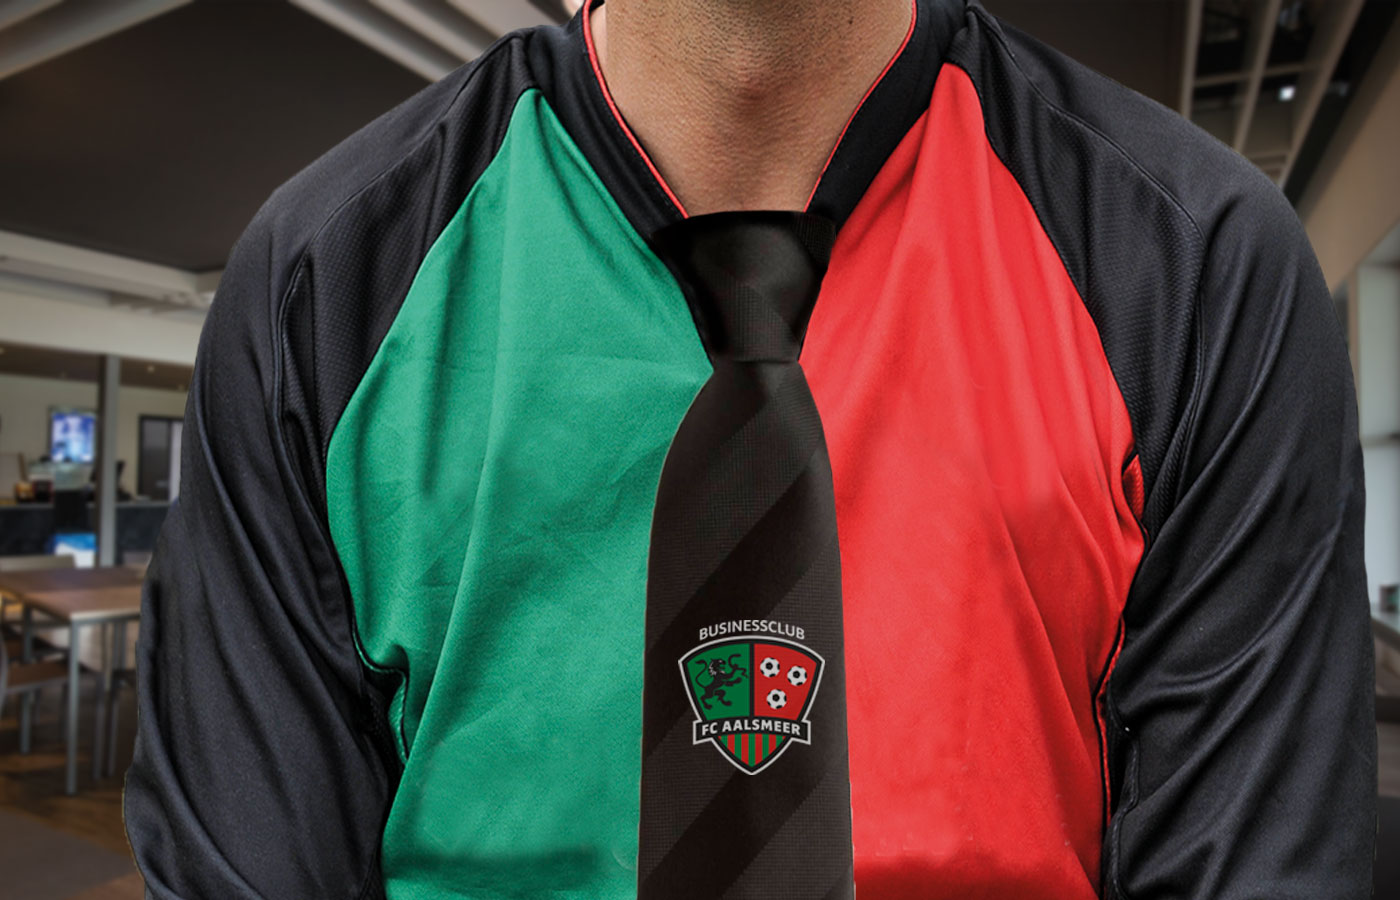 Businessclub FC Aalsmeer